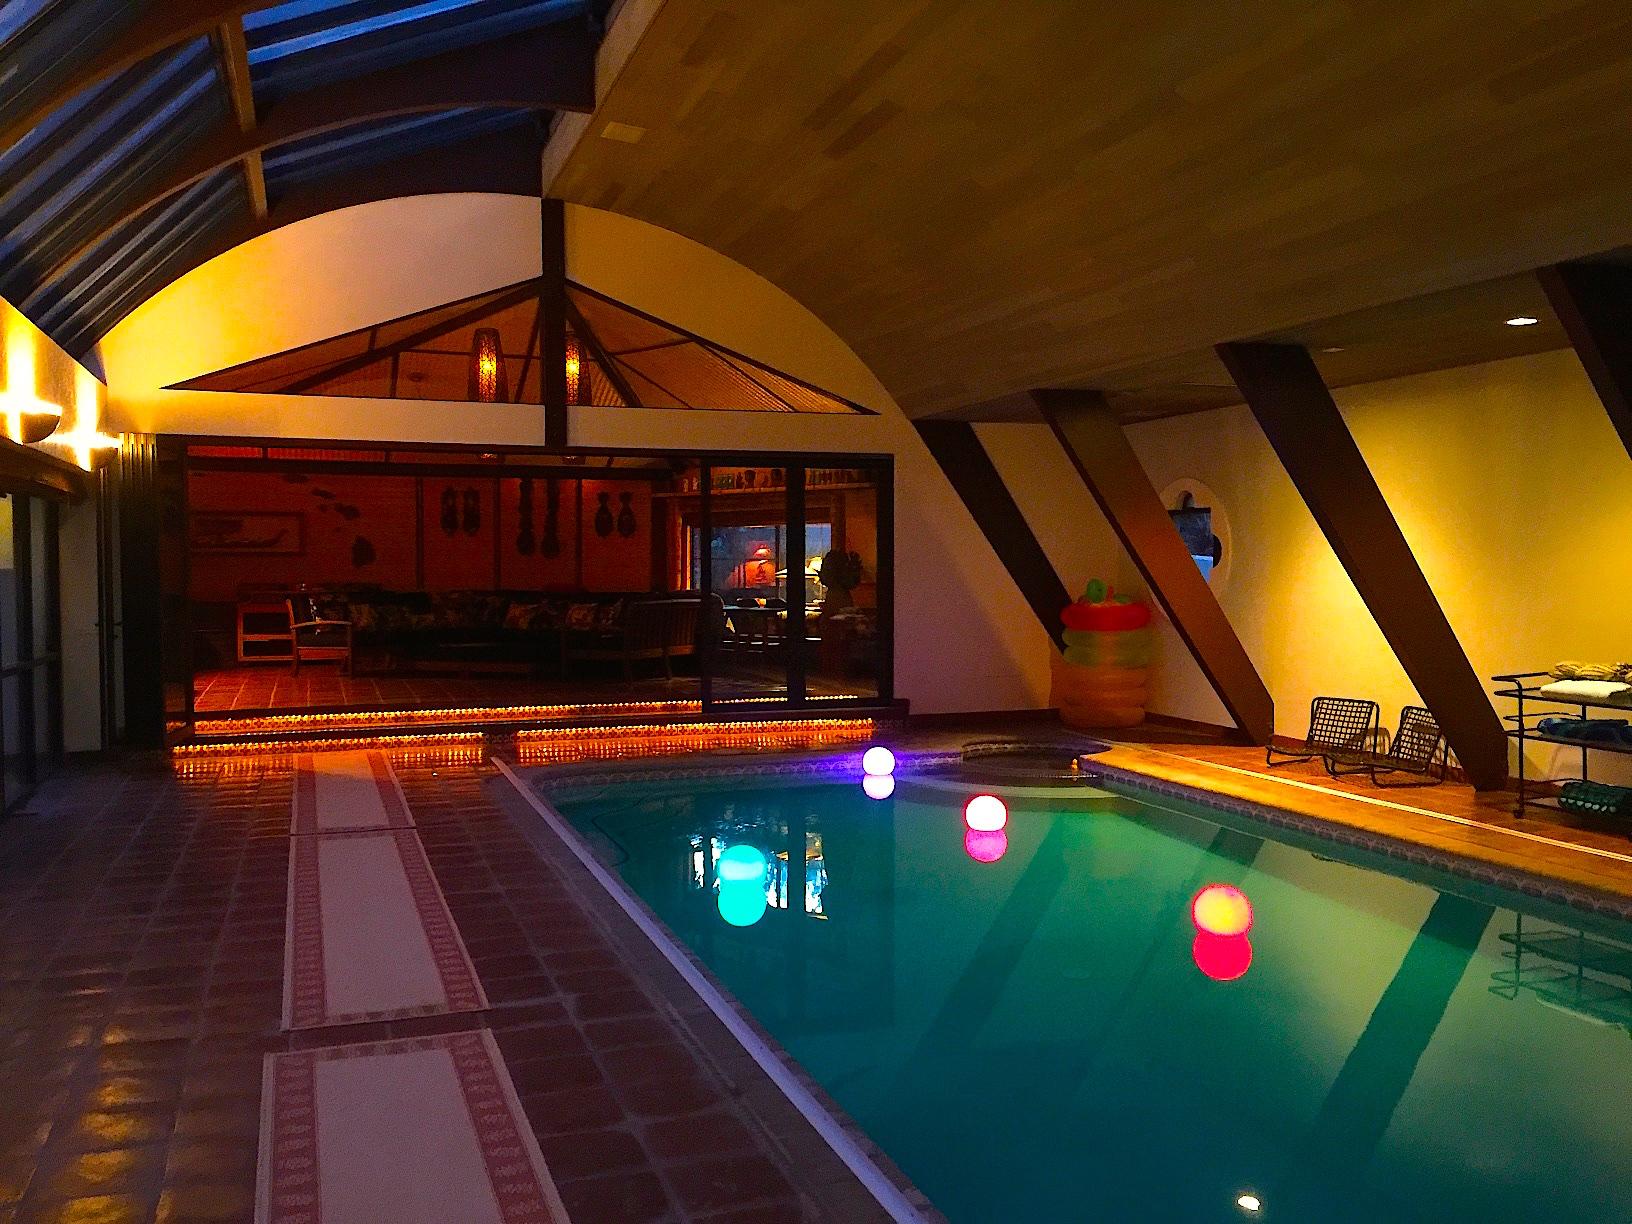 Pool NIght from Casita.jpg